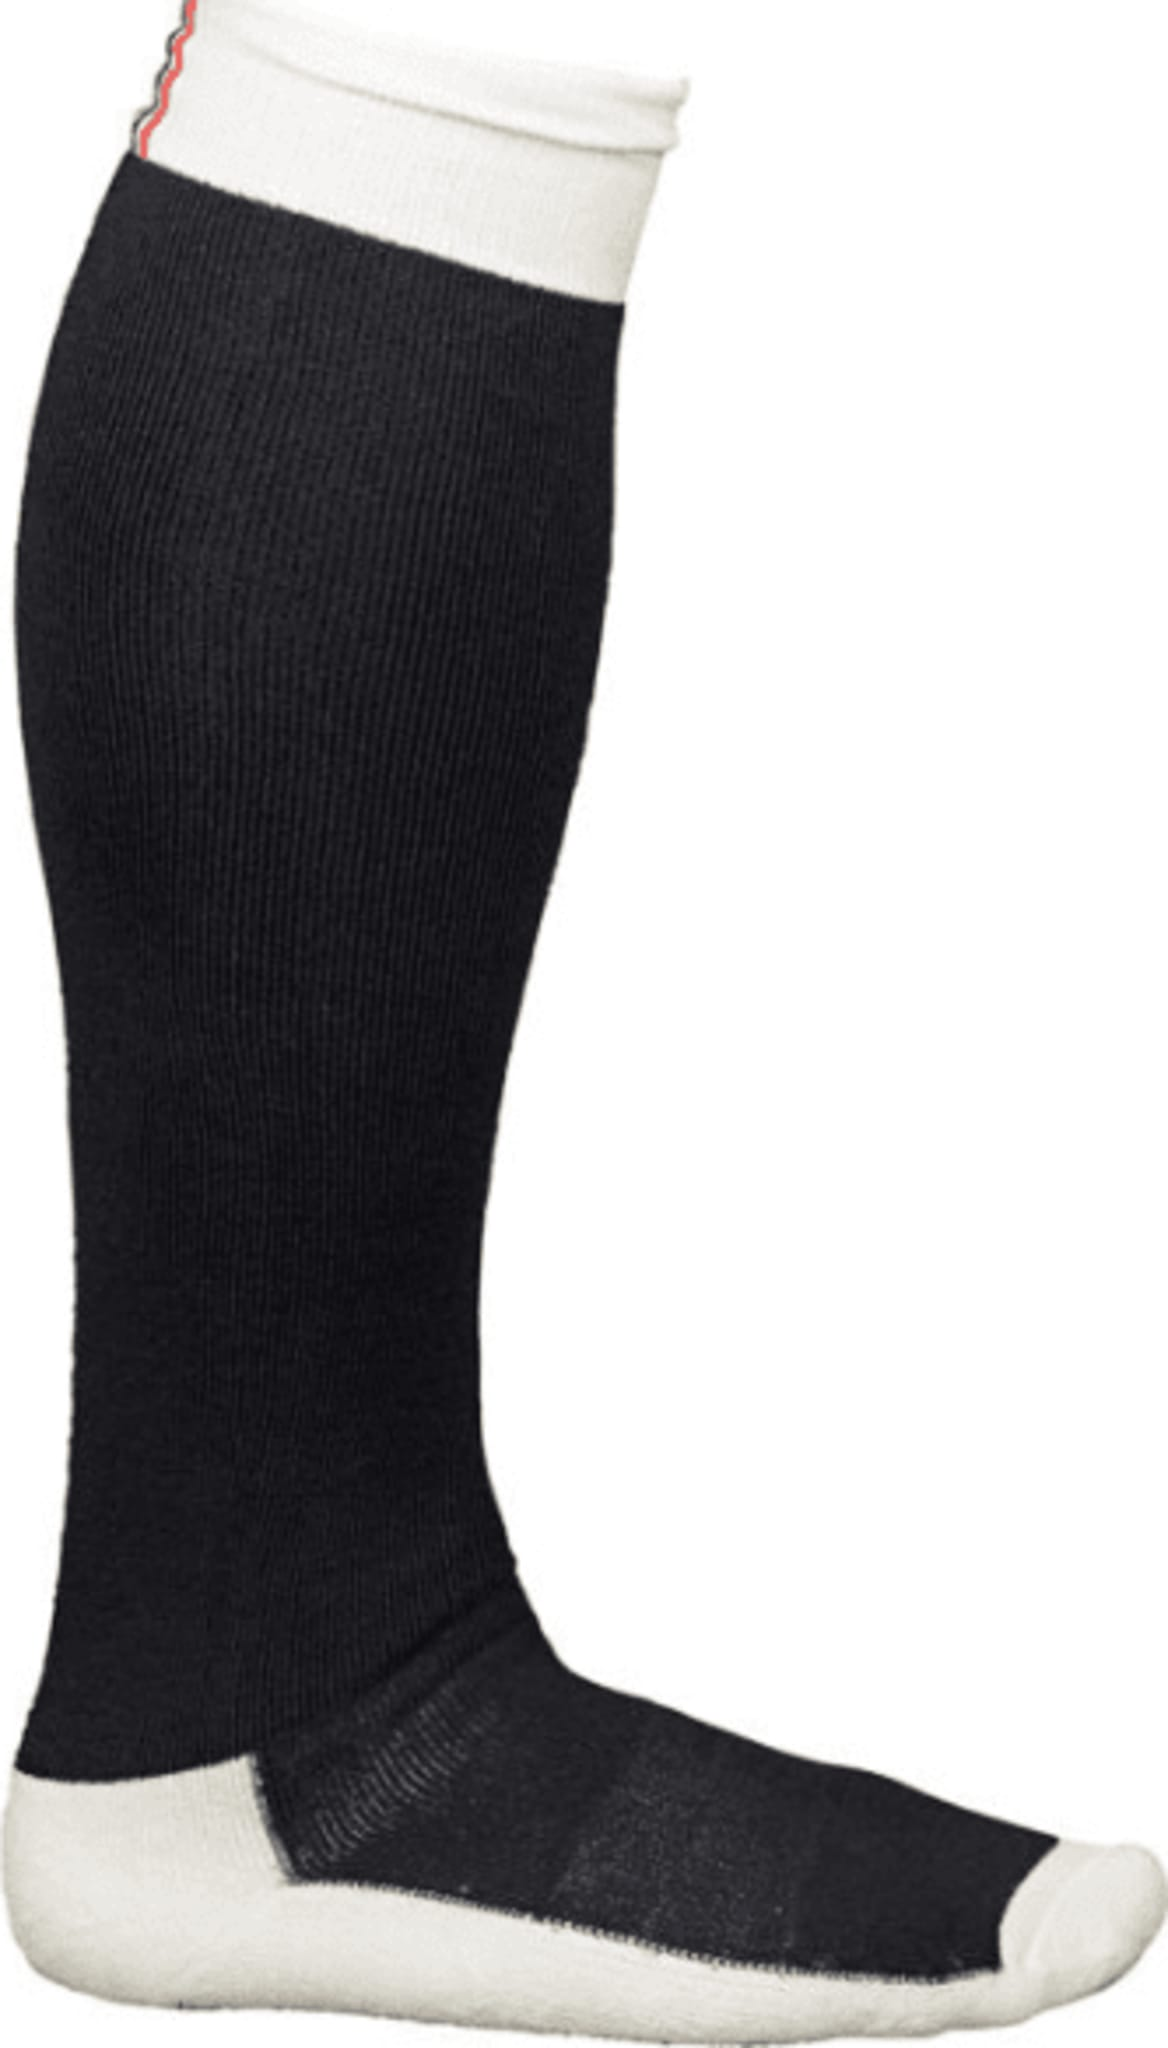 Amundsen Comfy Sock Unisex